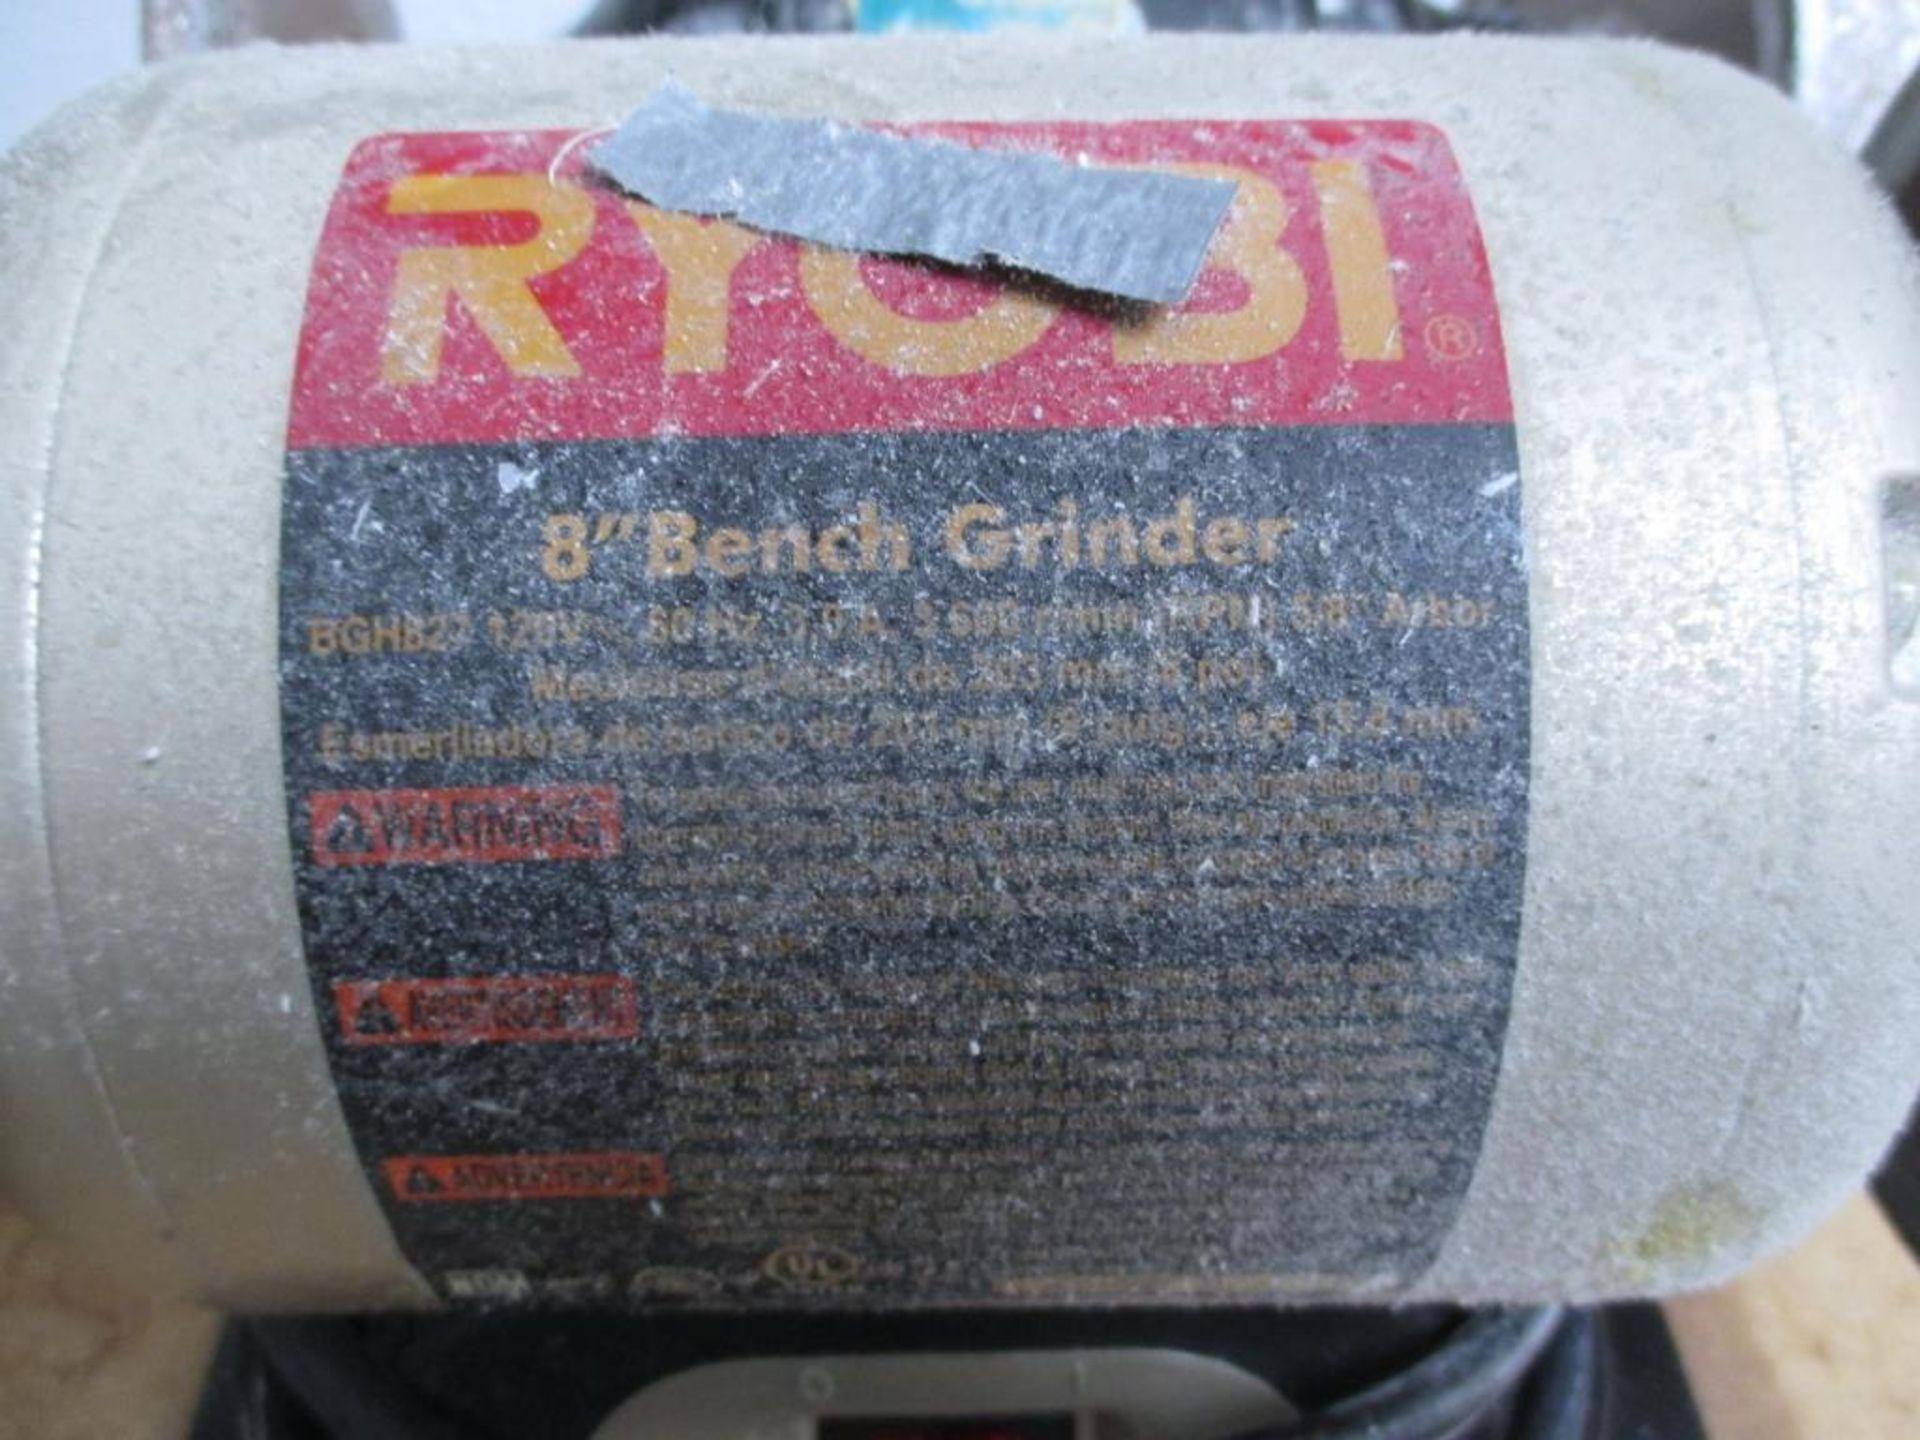 Lot 147 - Bench Grinders